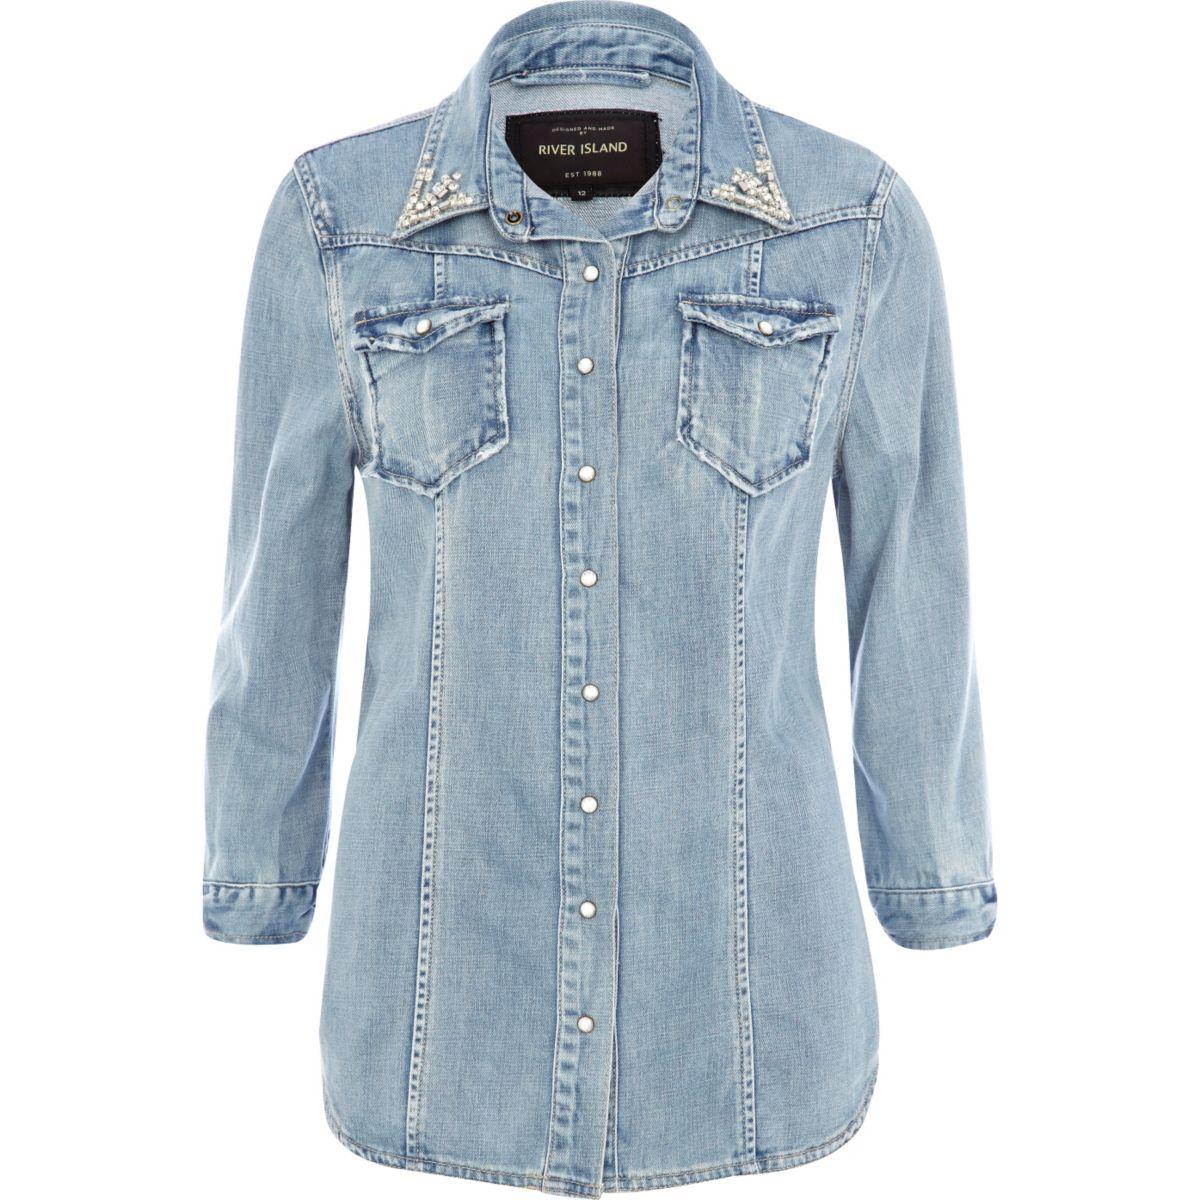 Light wash denim rhinestone collar outer shirt